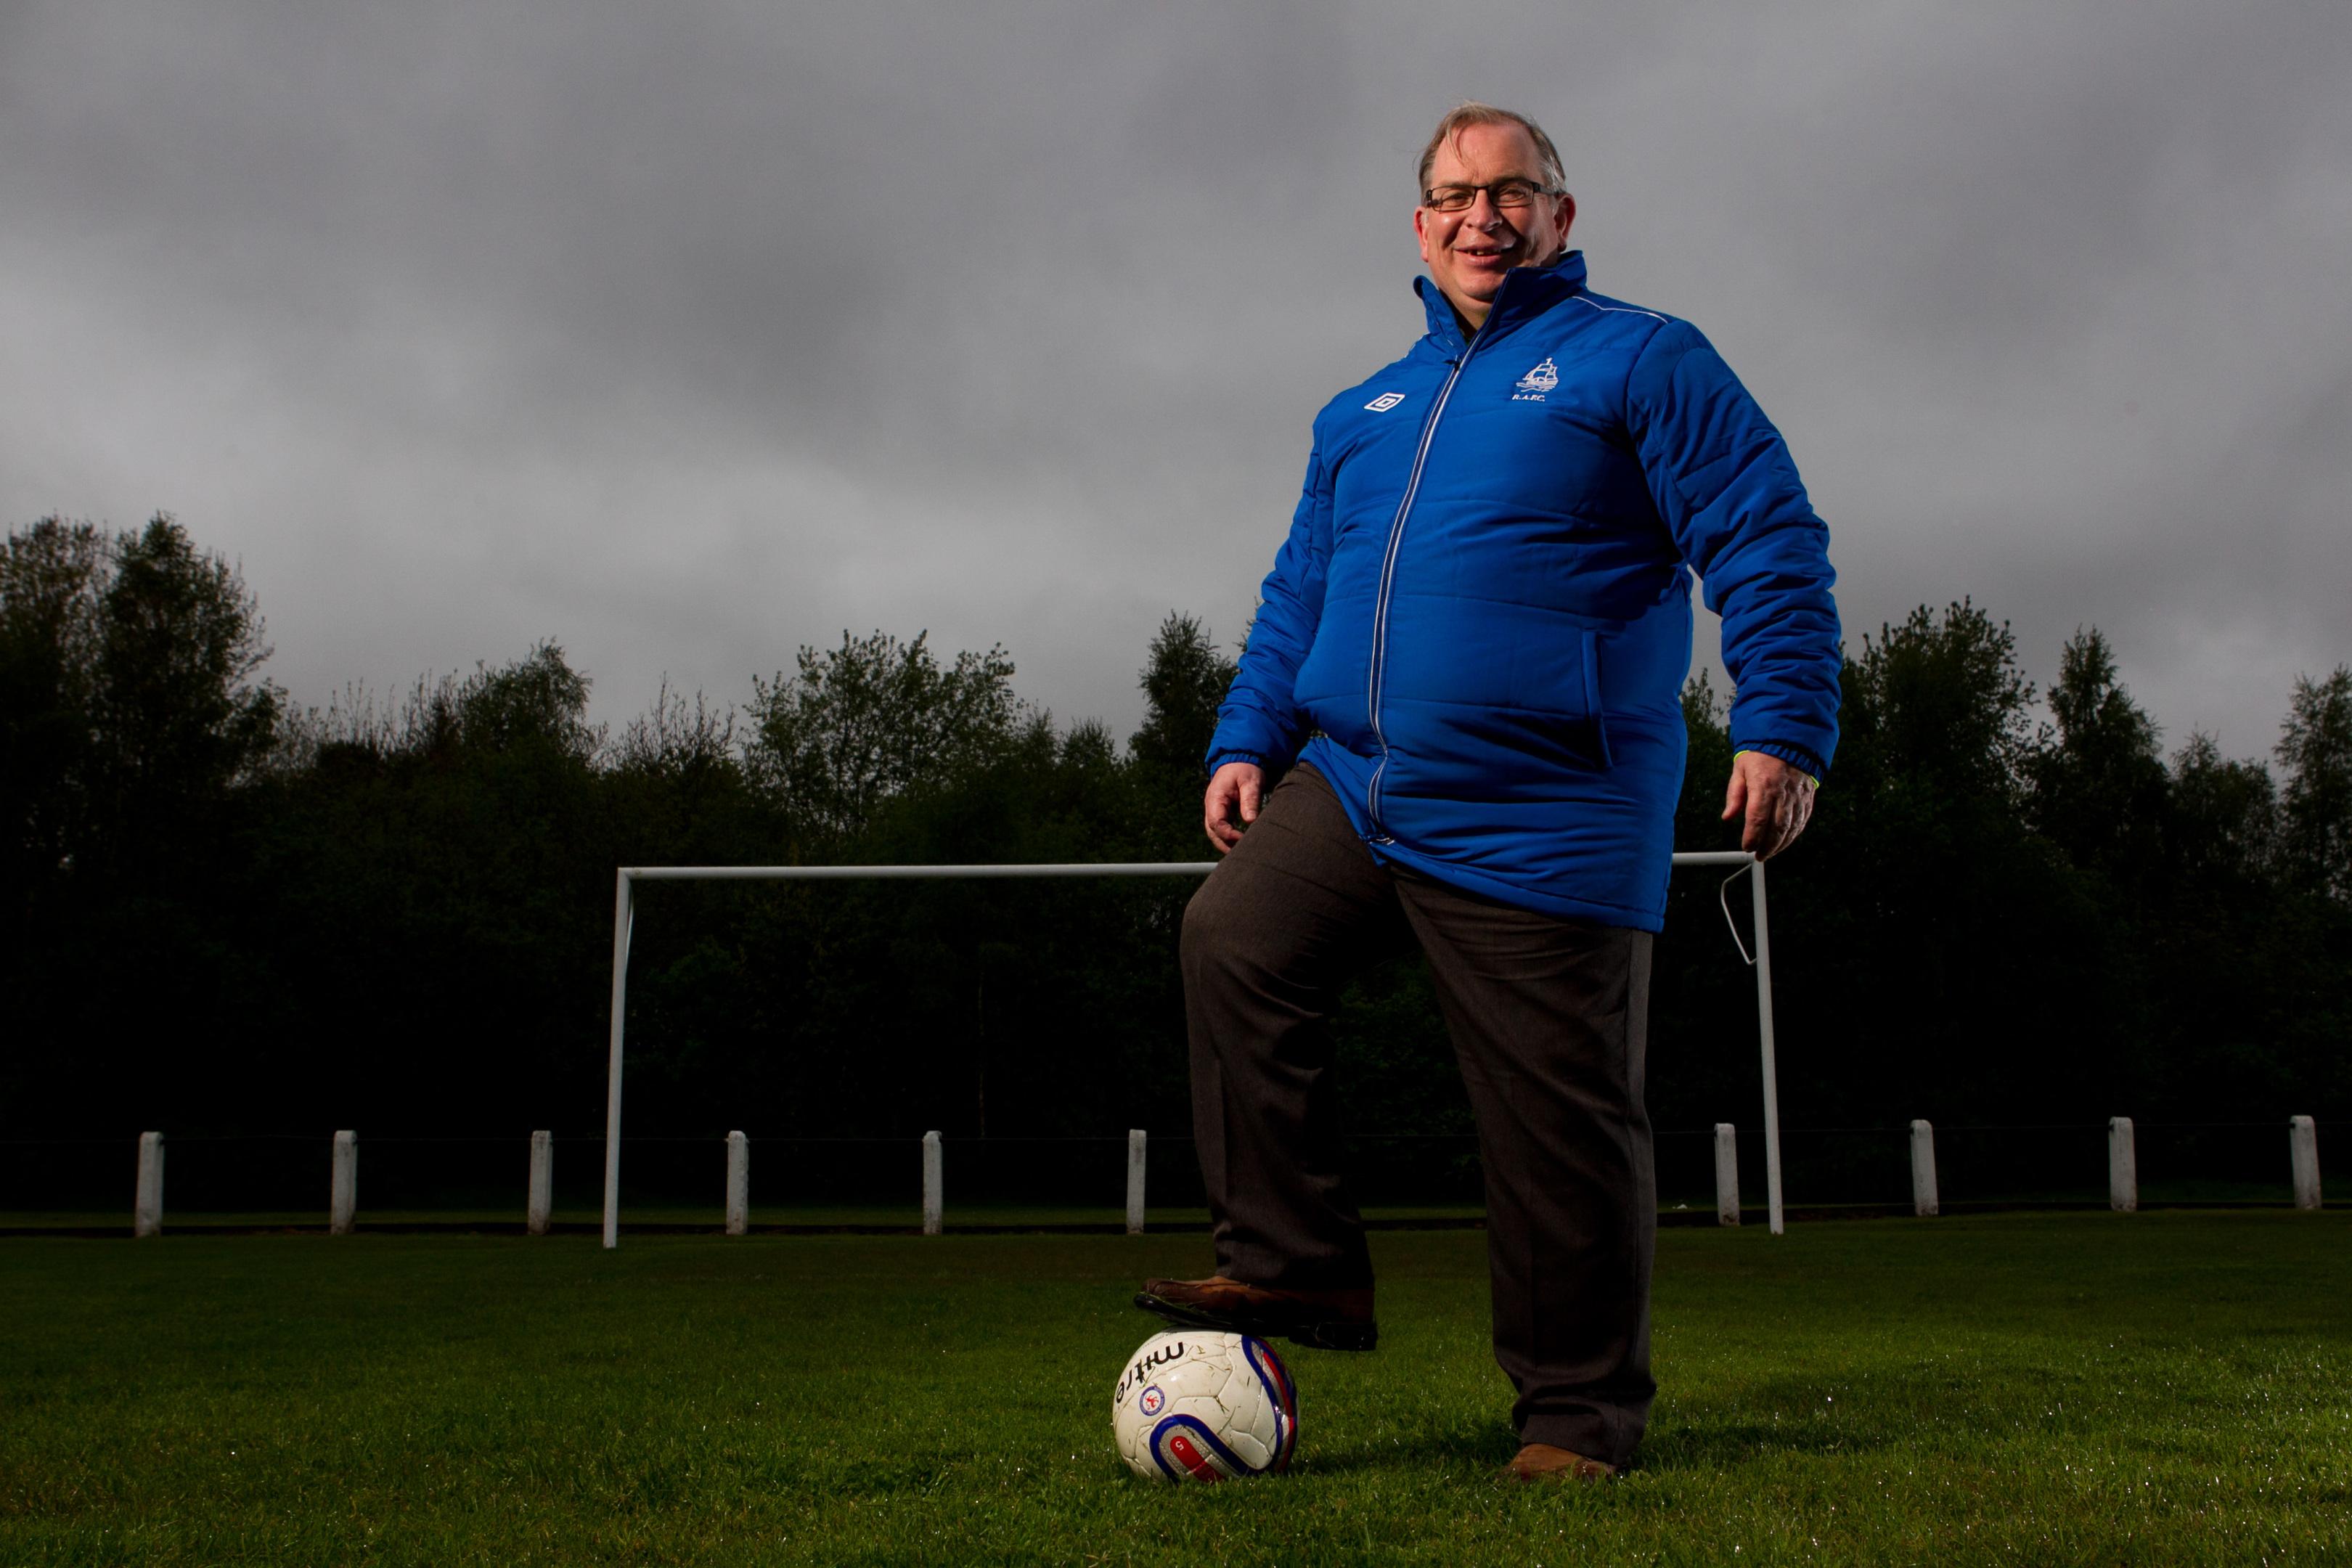 Peter Higgins, club secretary of Royal Albert Football Club (Andrew Cawley/ Sunday Post)